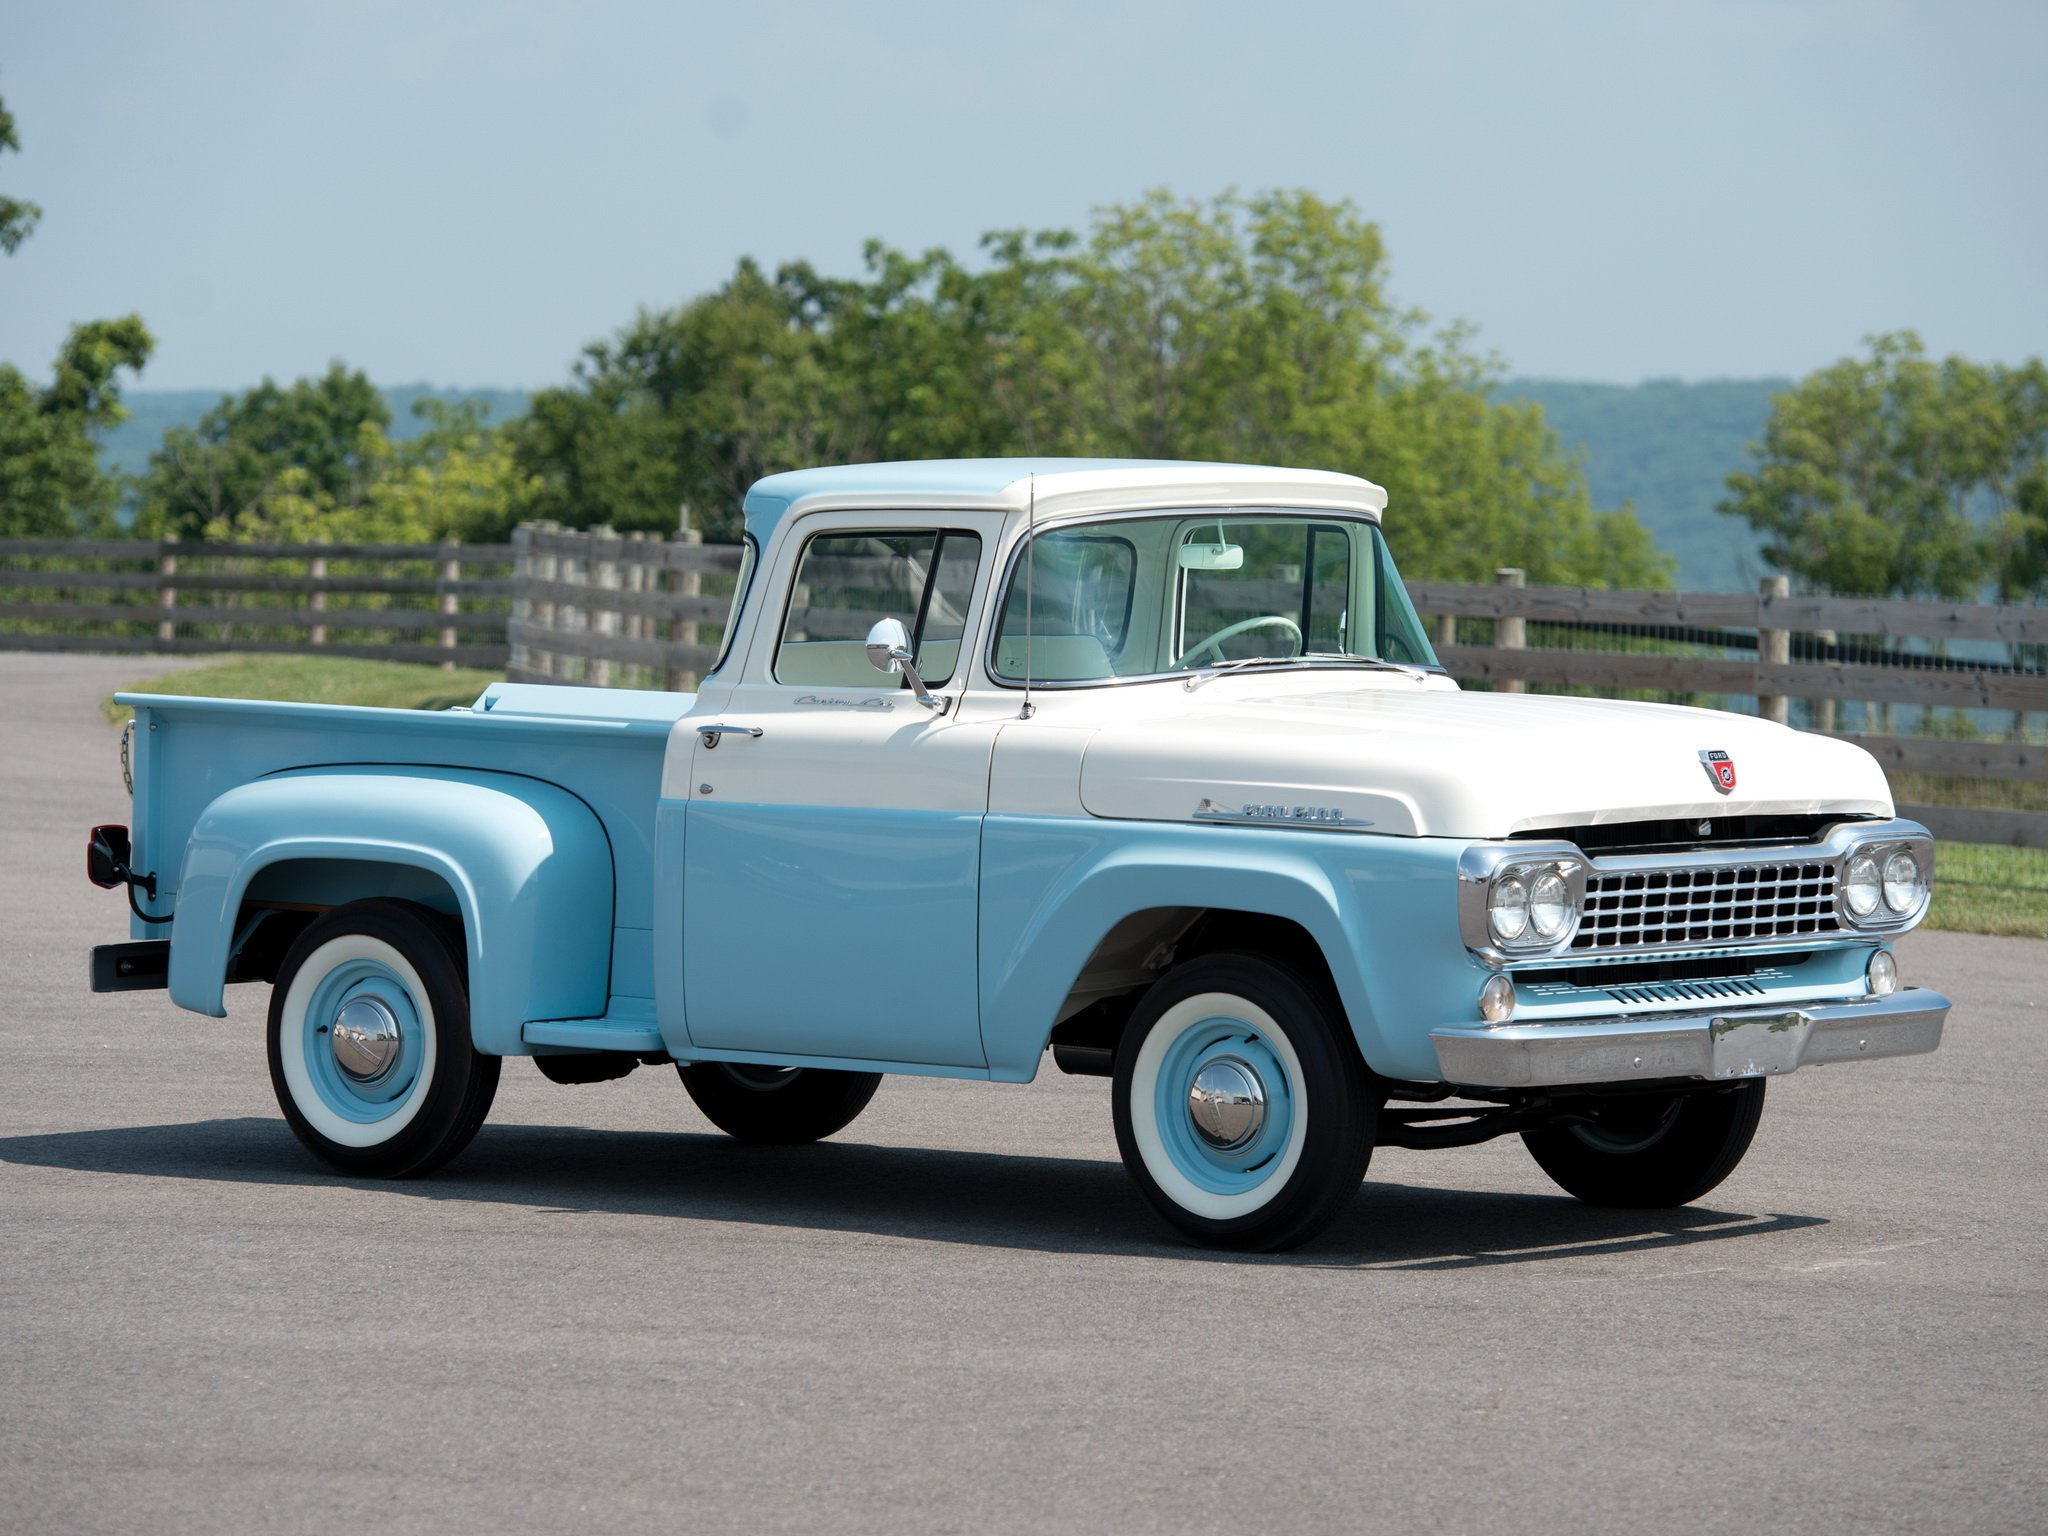 1958 ford f 100 custom cab flareside pickup 8 3 f100 retro wallpaper 2048x1536 435179 wallpaperup